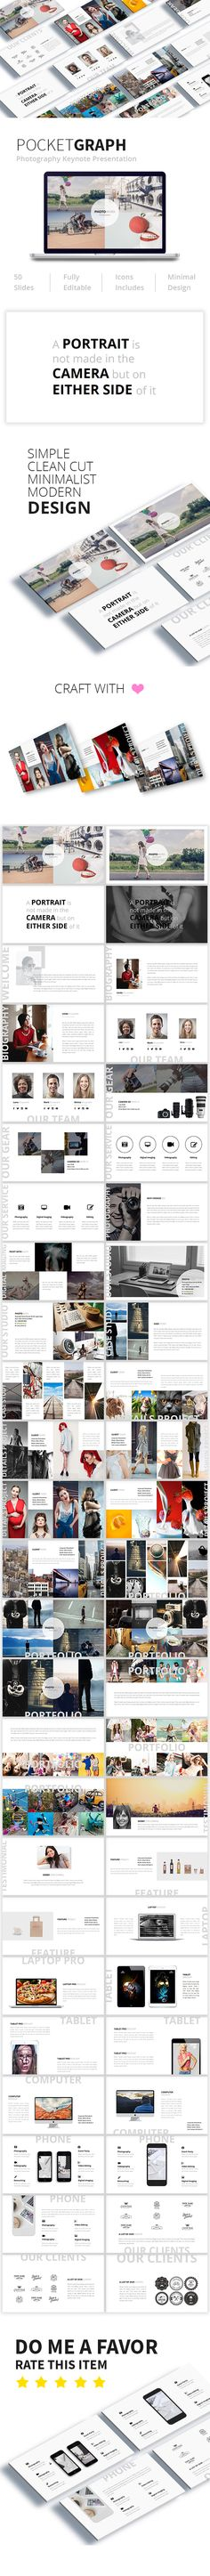 Pocketgraph Photography Keynote Presentation